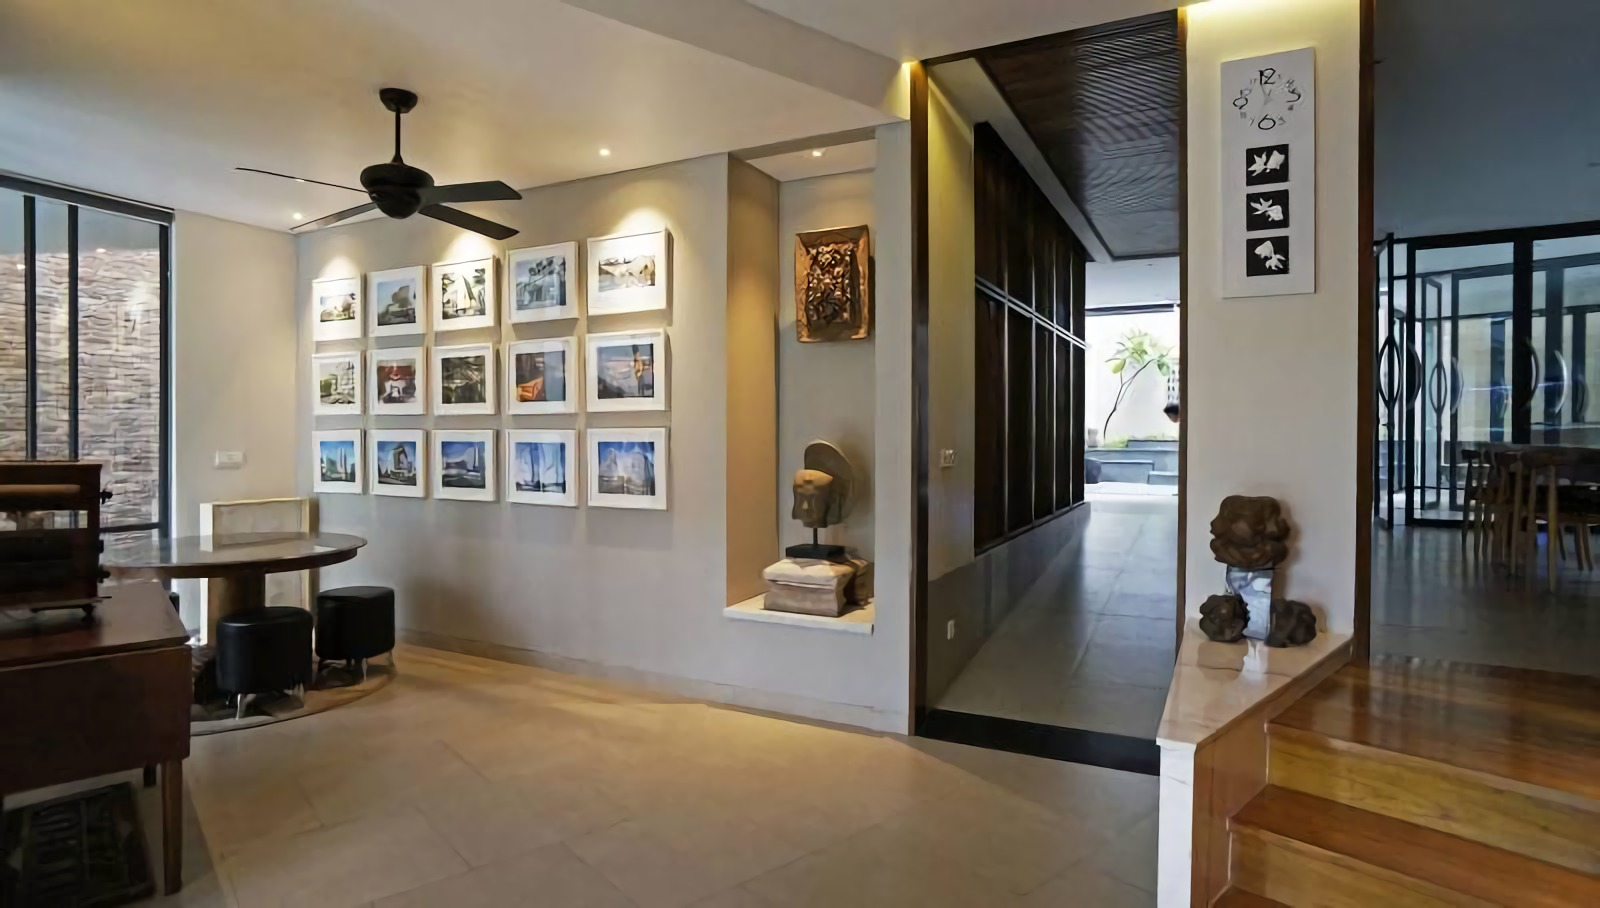 Berbagai karya seni menghiasi lobby SSA New Office (Sumber: arsitag.com)